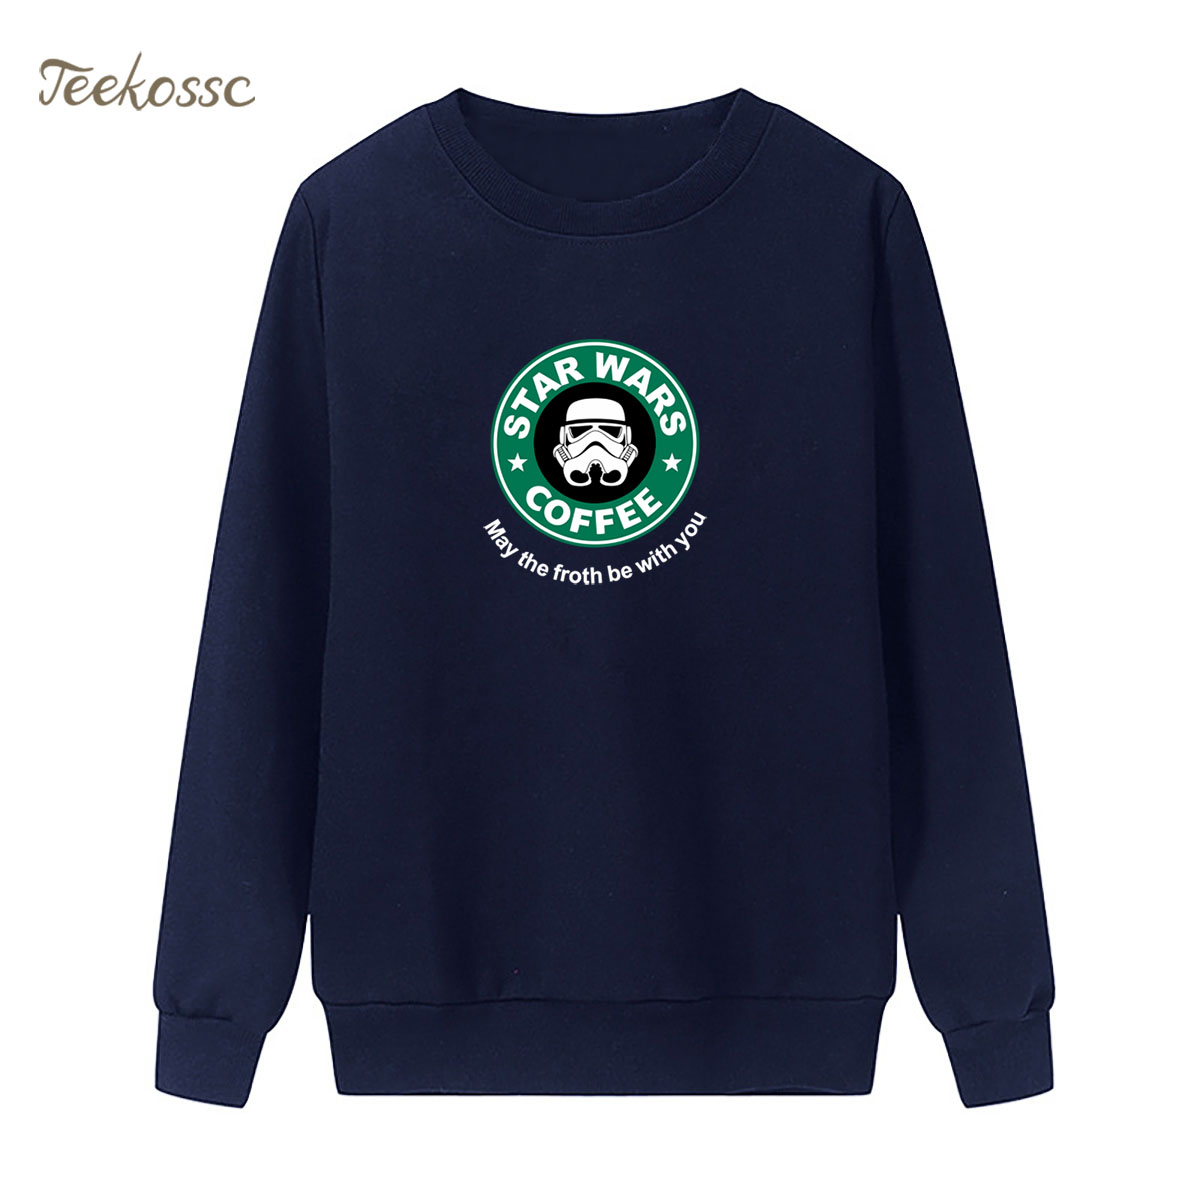 Star Wars Sweatshirt Coffee Print Hoodie 2018 New Brand Winter Autumn Women Lasdies Pullover Loose Fleece StarWars Streetwear